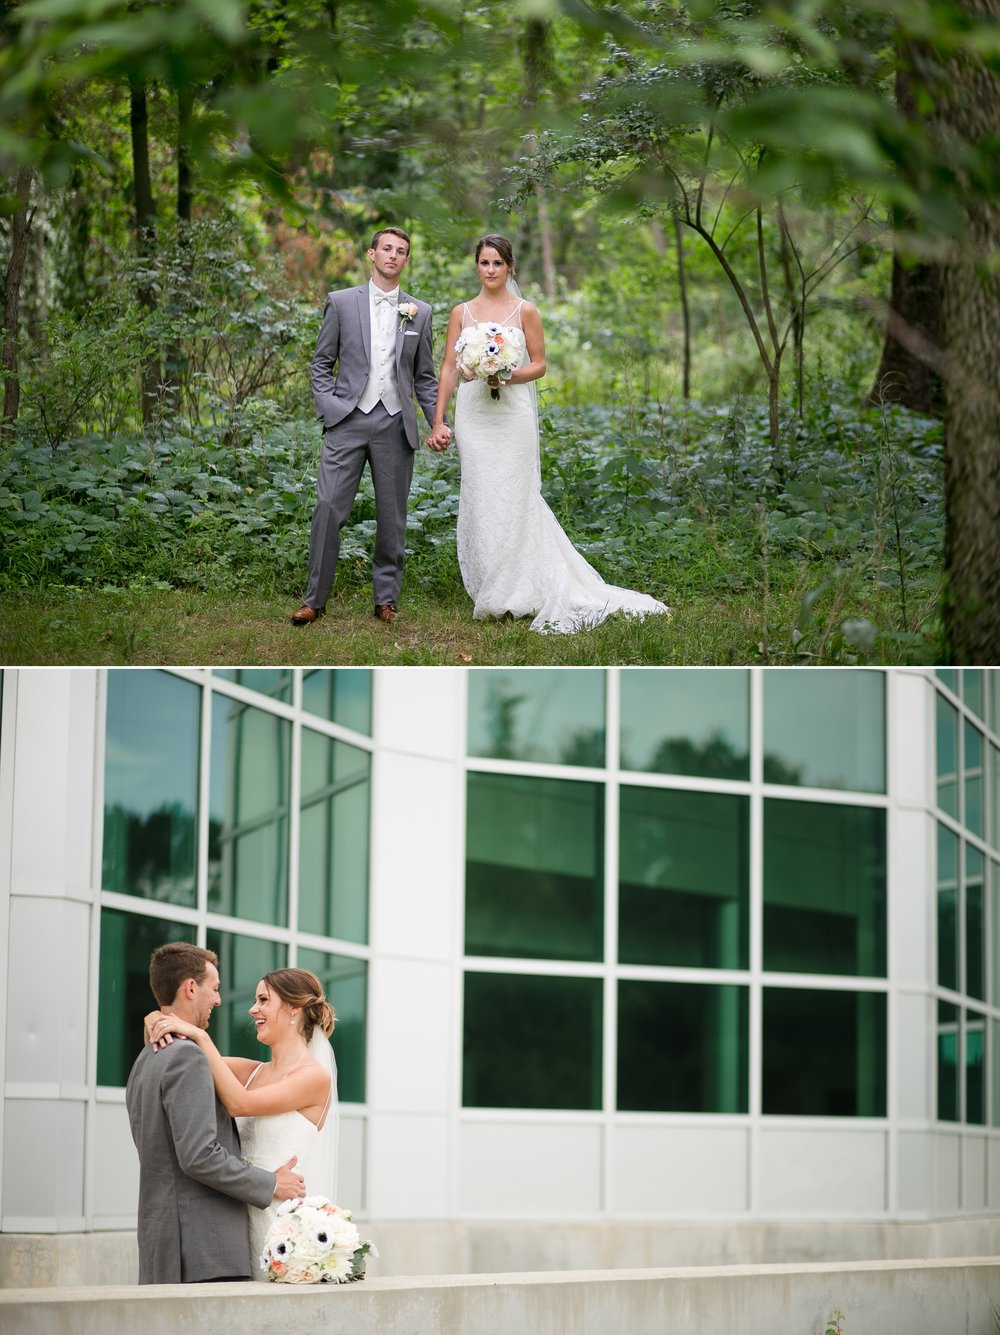 Highland-meadows-wedding-photos 5.jpg